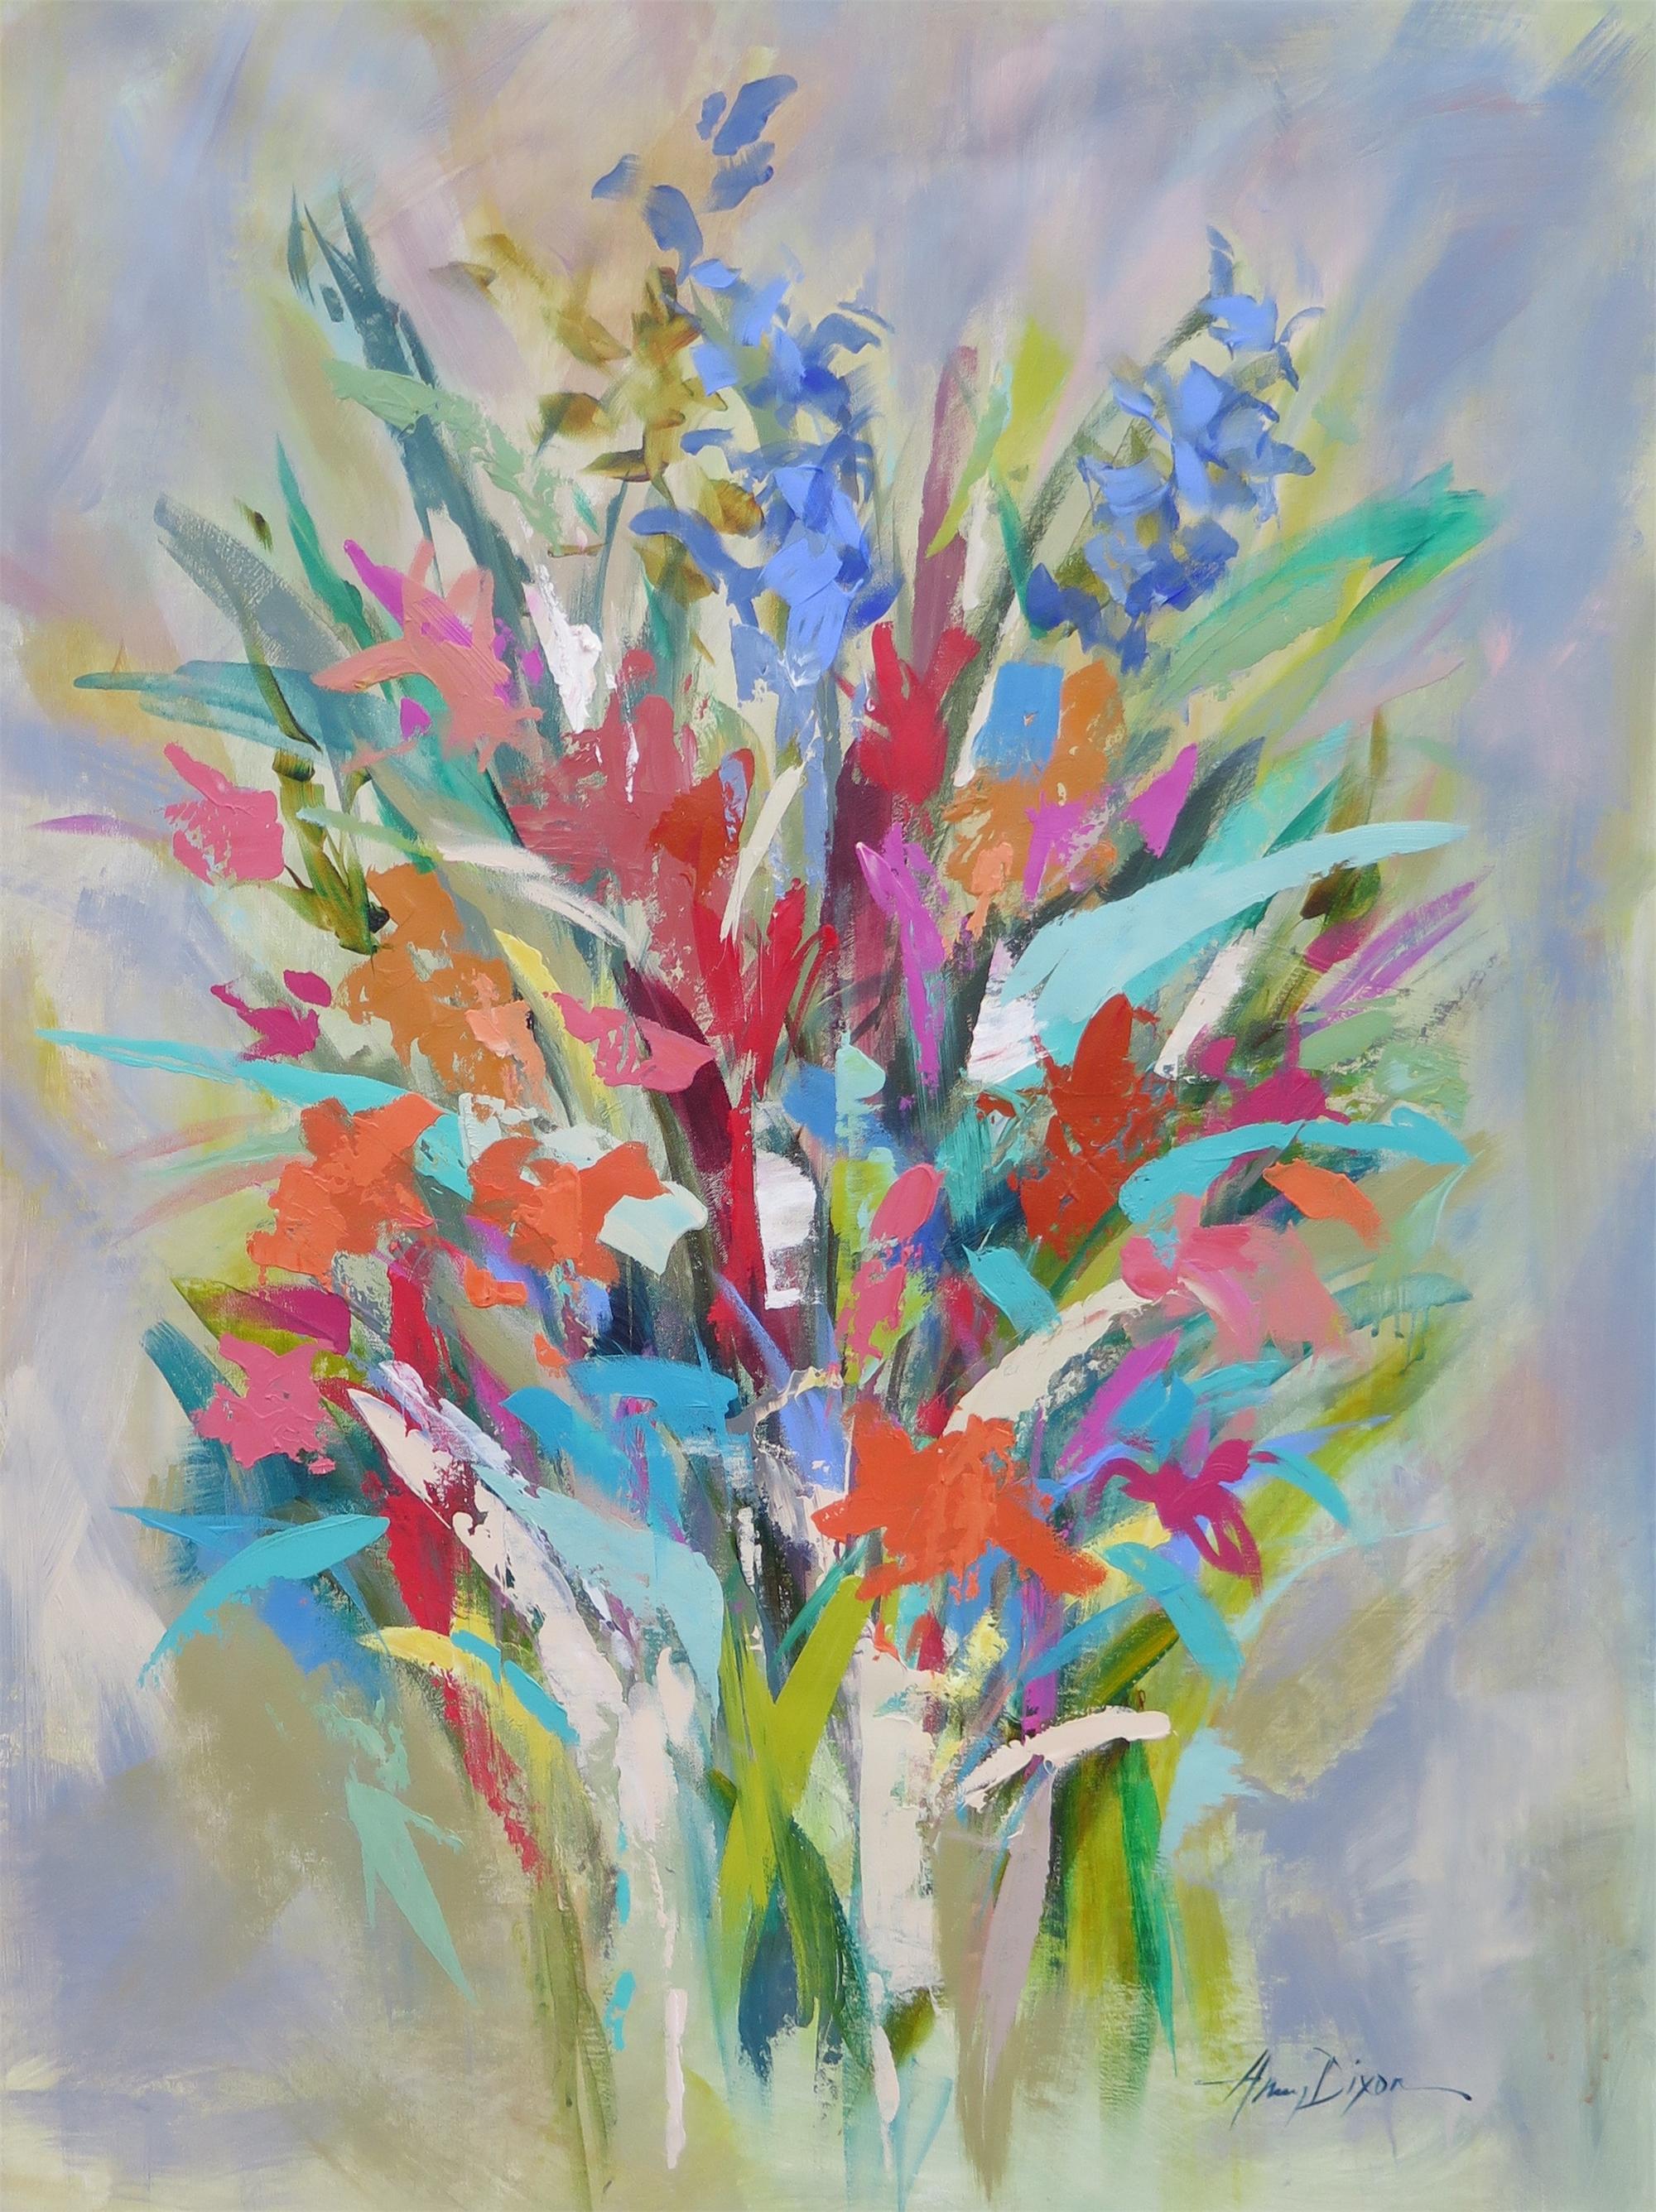 """Abundance I"" Commission by Amy Dixon"